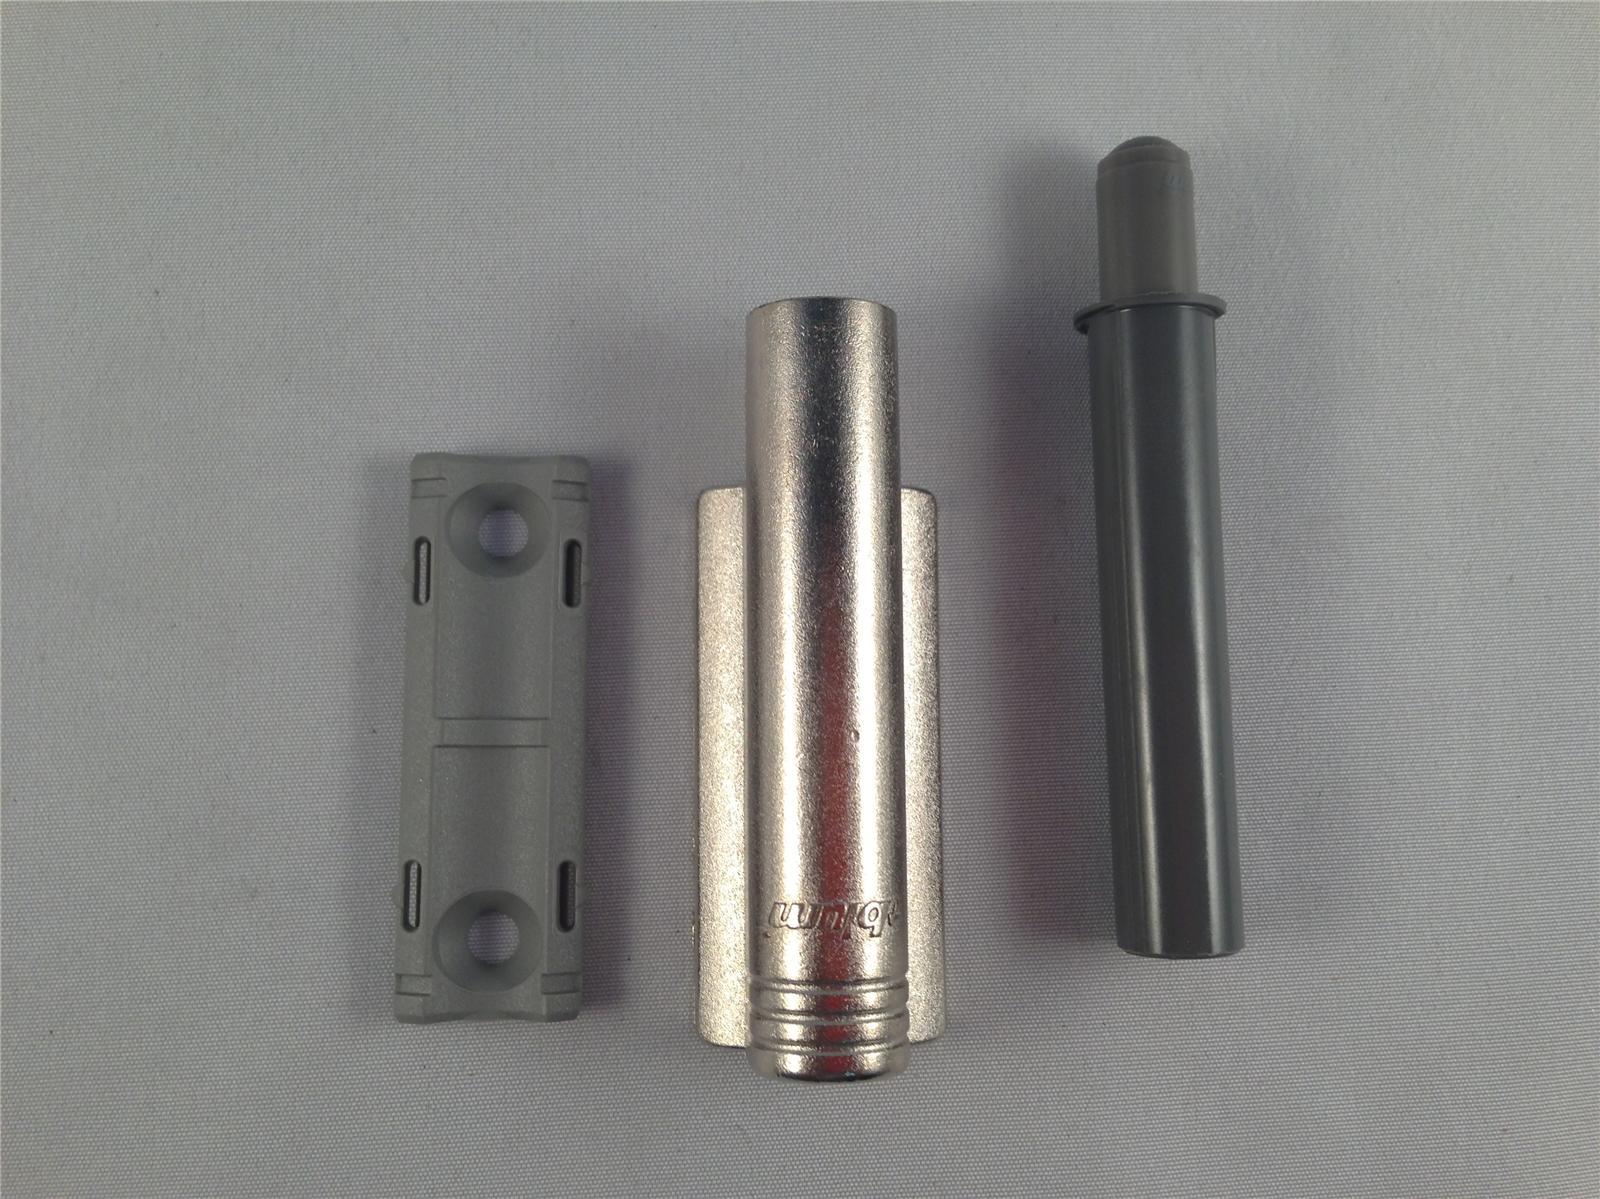 Blum Blumotion 970a Cabinet Soft Close Soft Closing Face